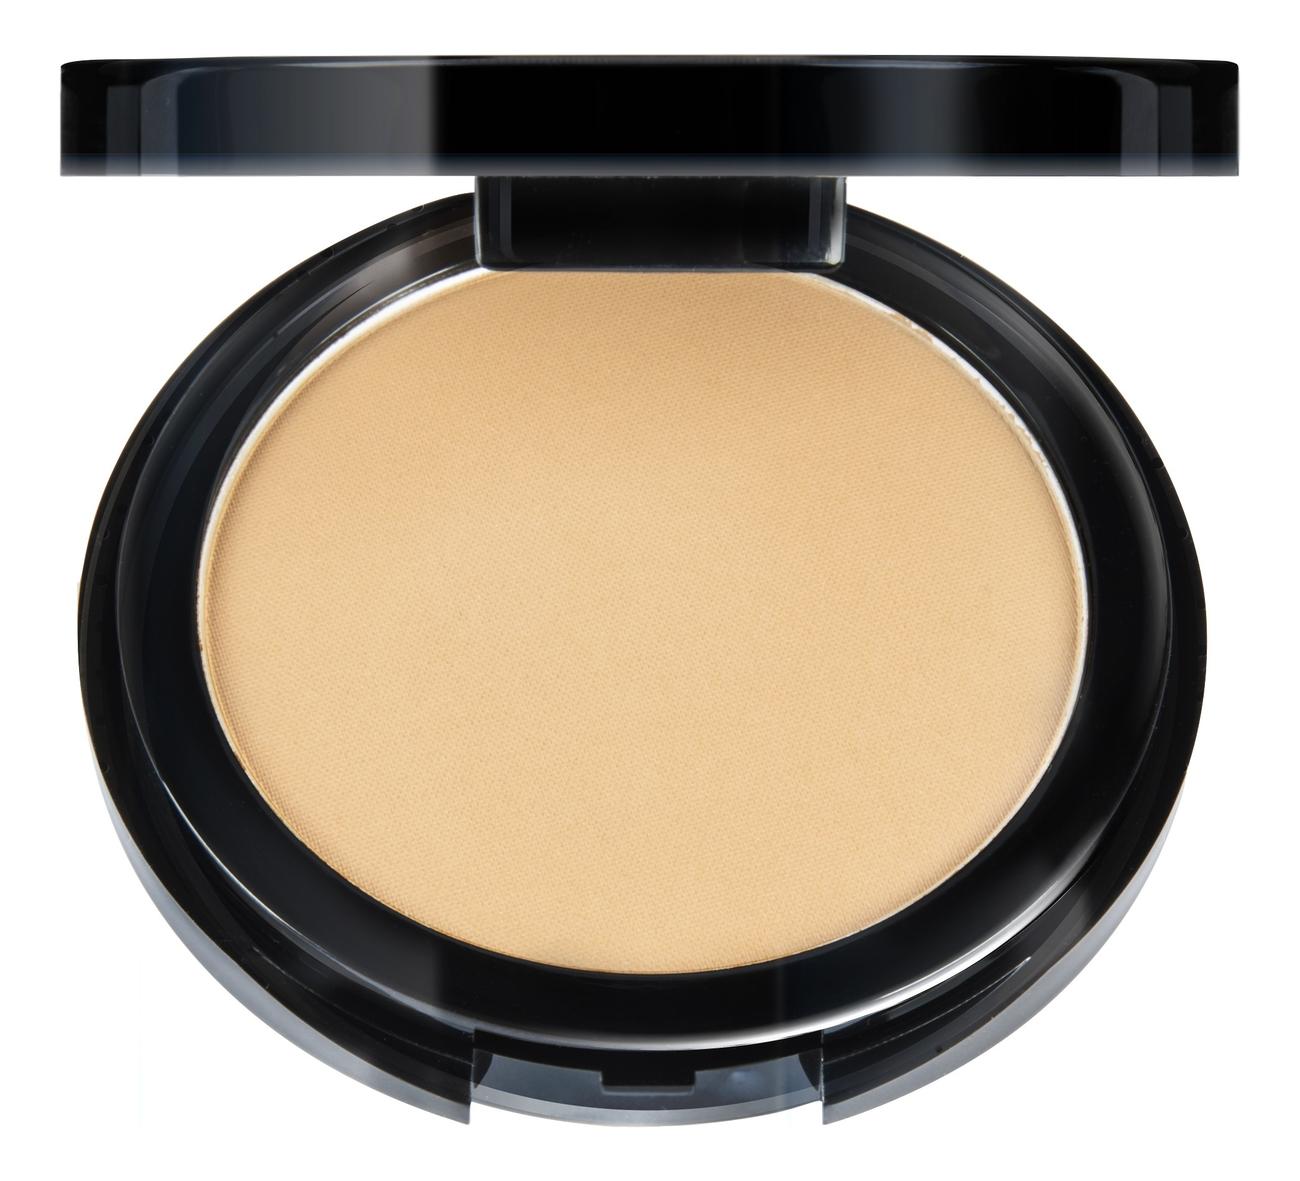 Купить Пудровая тональная основа HD Flawless Powder Foundation: HDPF04 Nude, ABSOLUTE New York